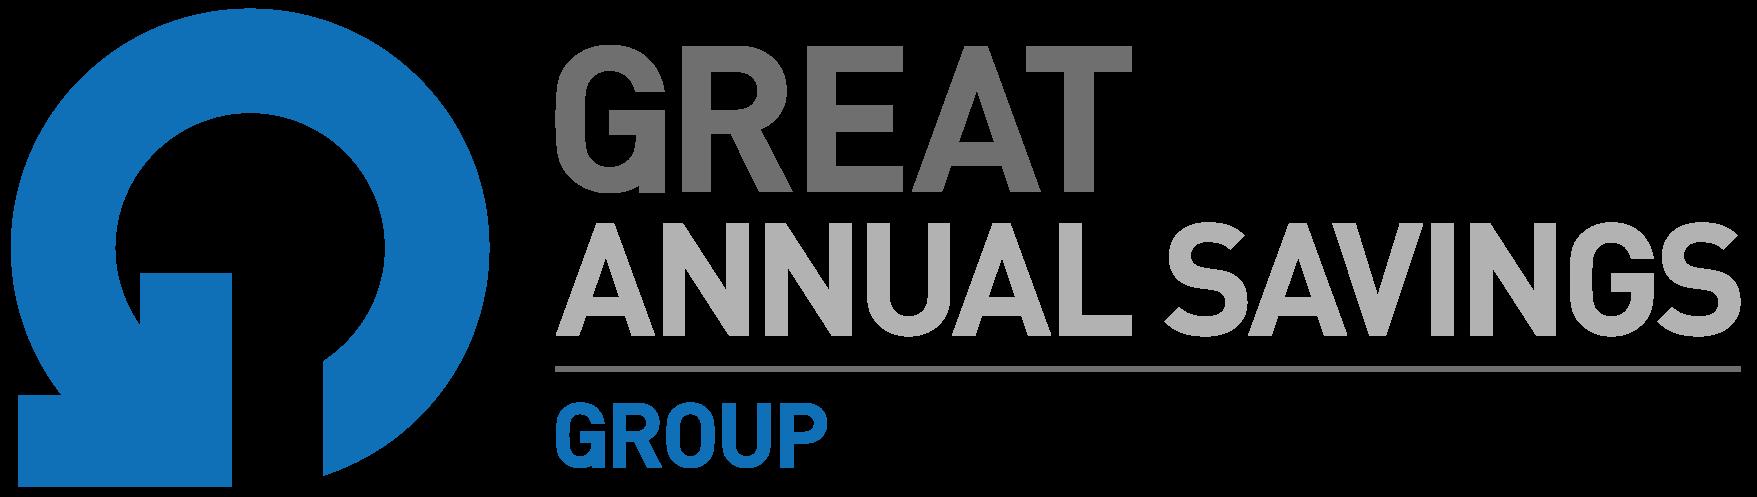 Great Annual Savings Logo